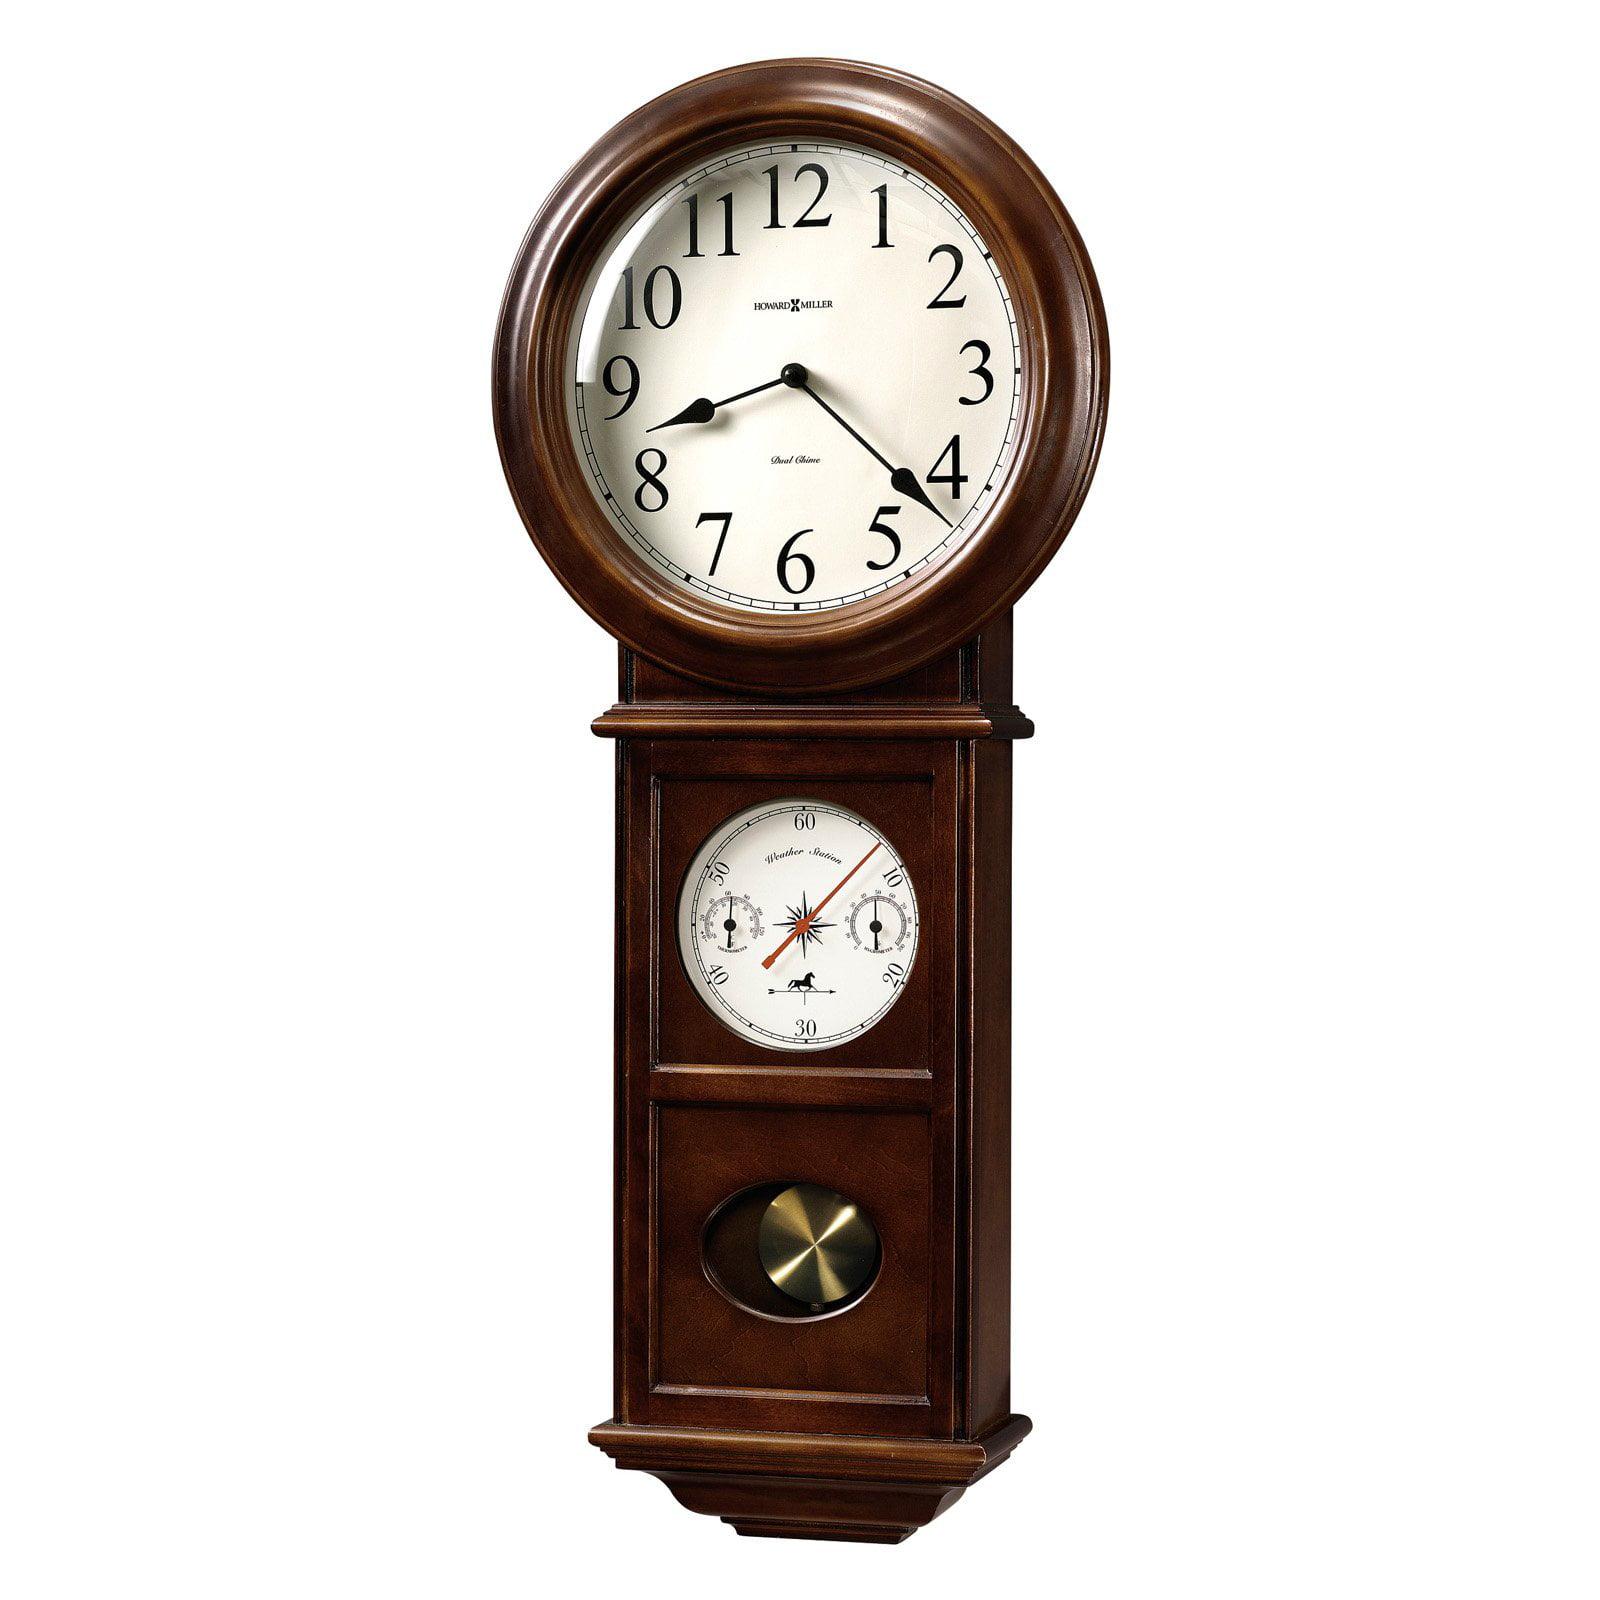 Howard Miller 625-399 Crowley Wall Clock - 14-in. Wide